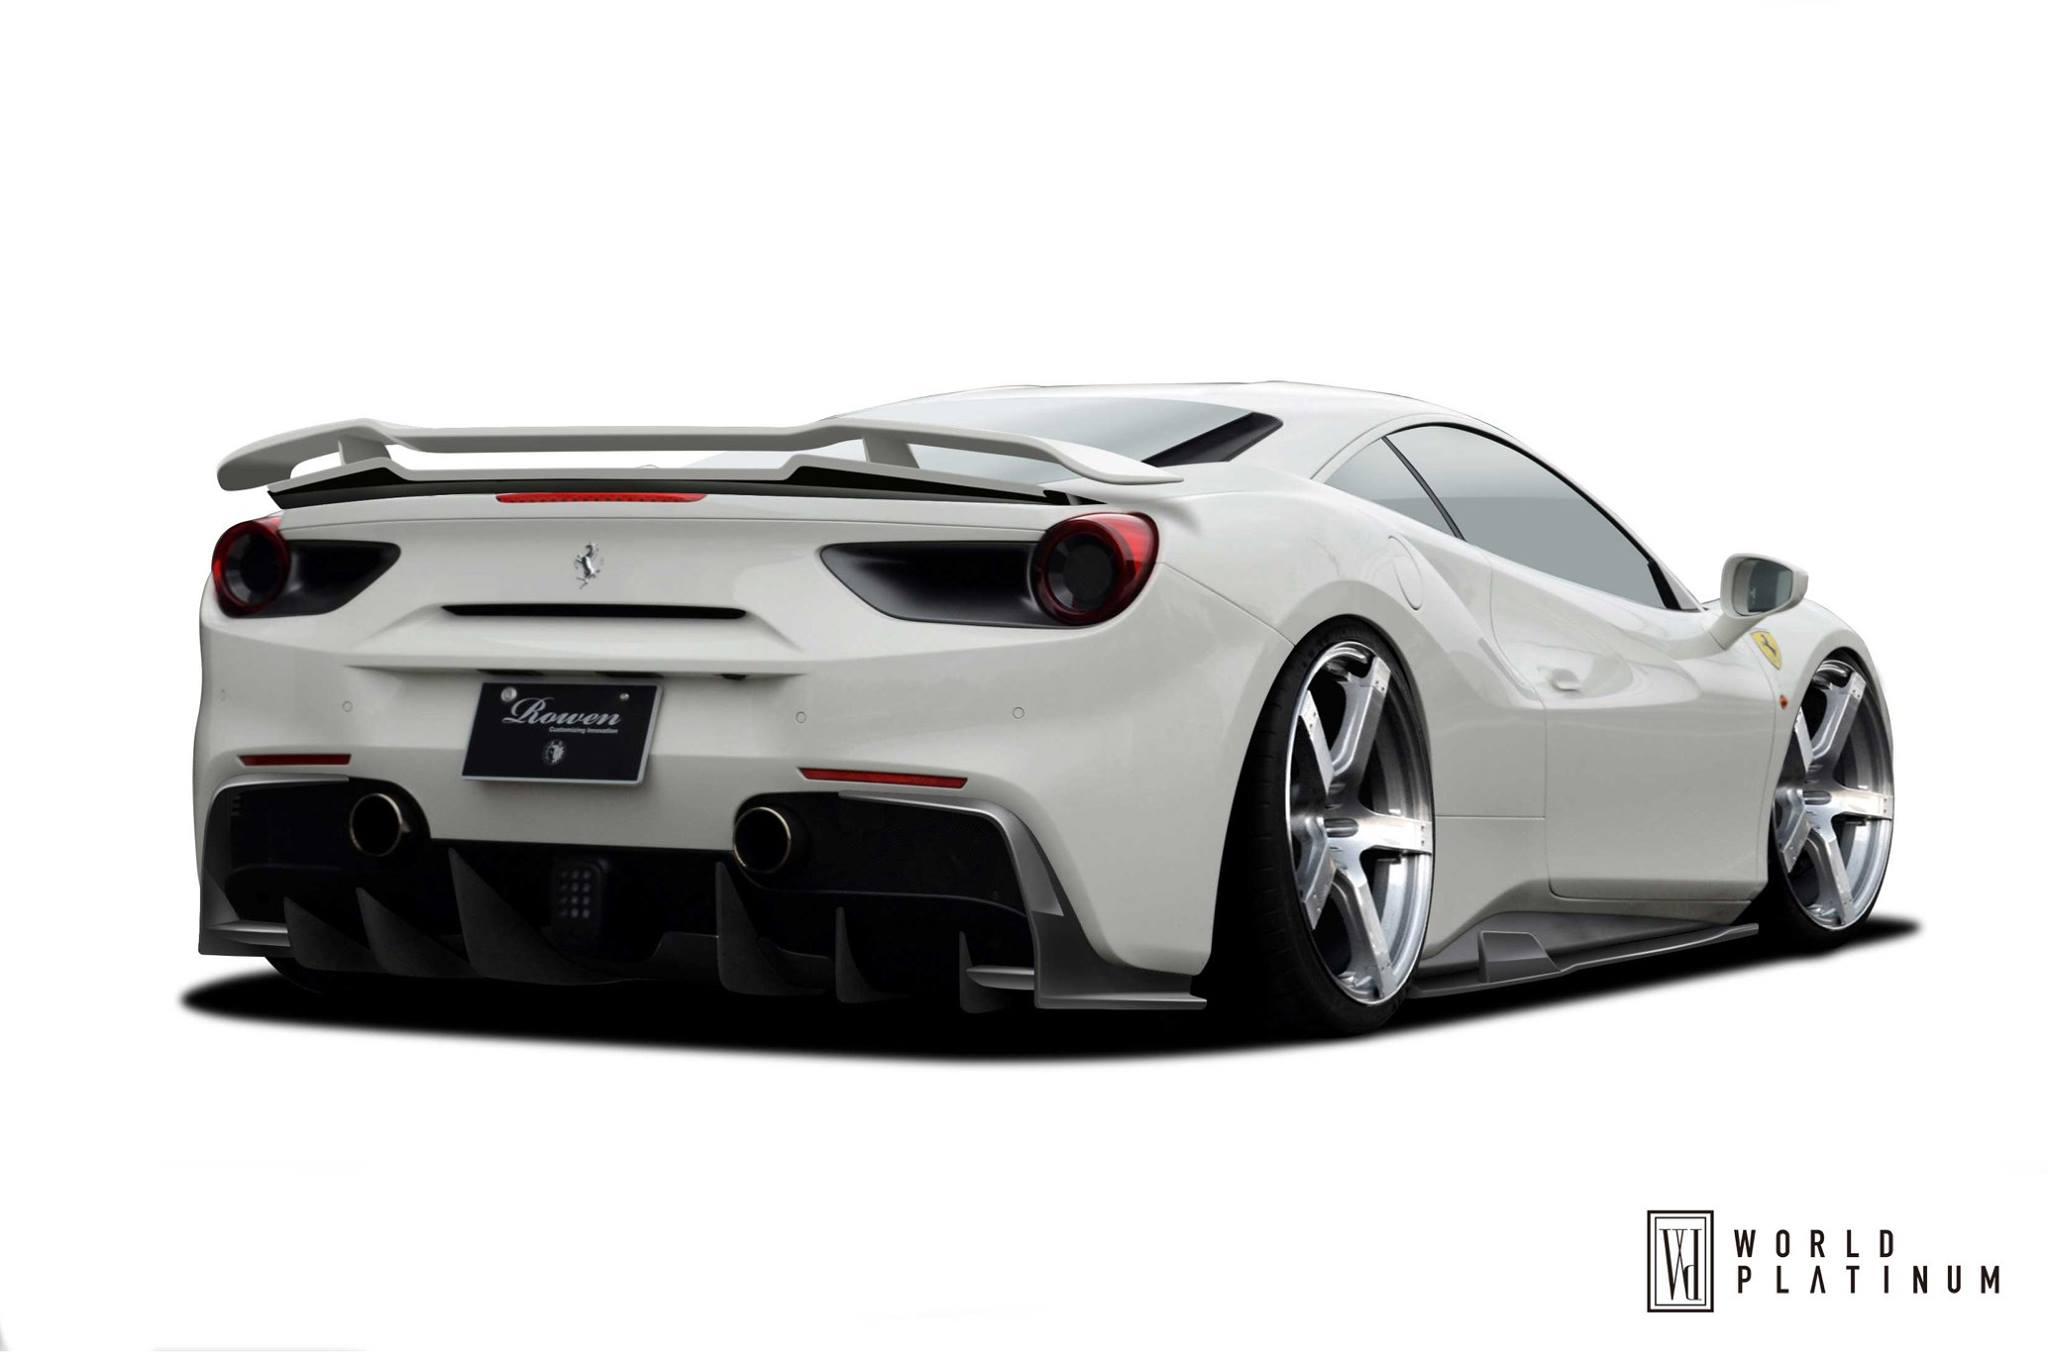 Wonderful ... Ferrari 488 GTB From Rowen Is 100% Japanese Tuning ...